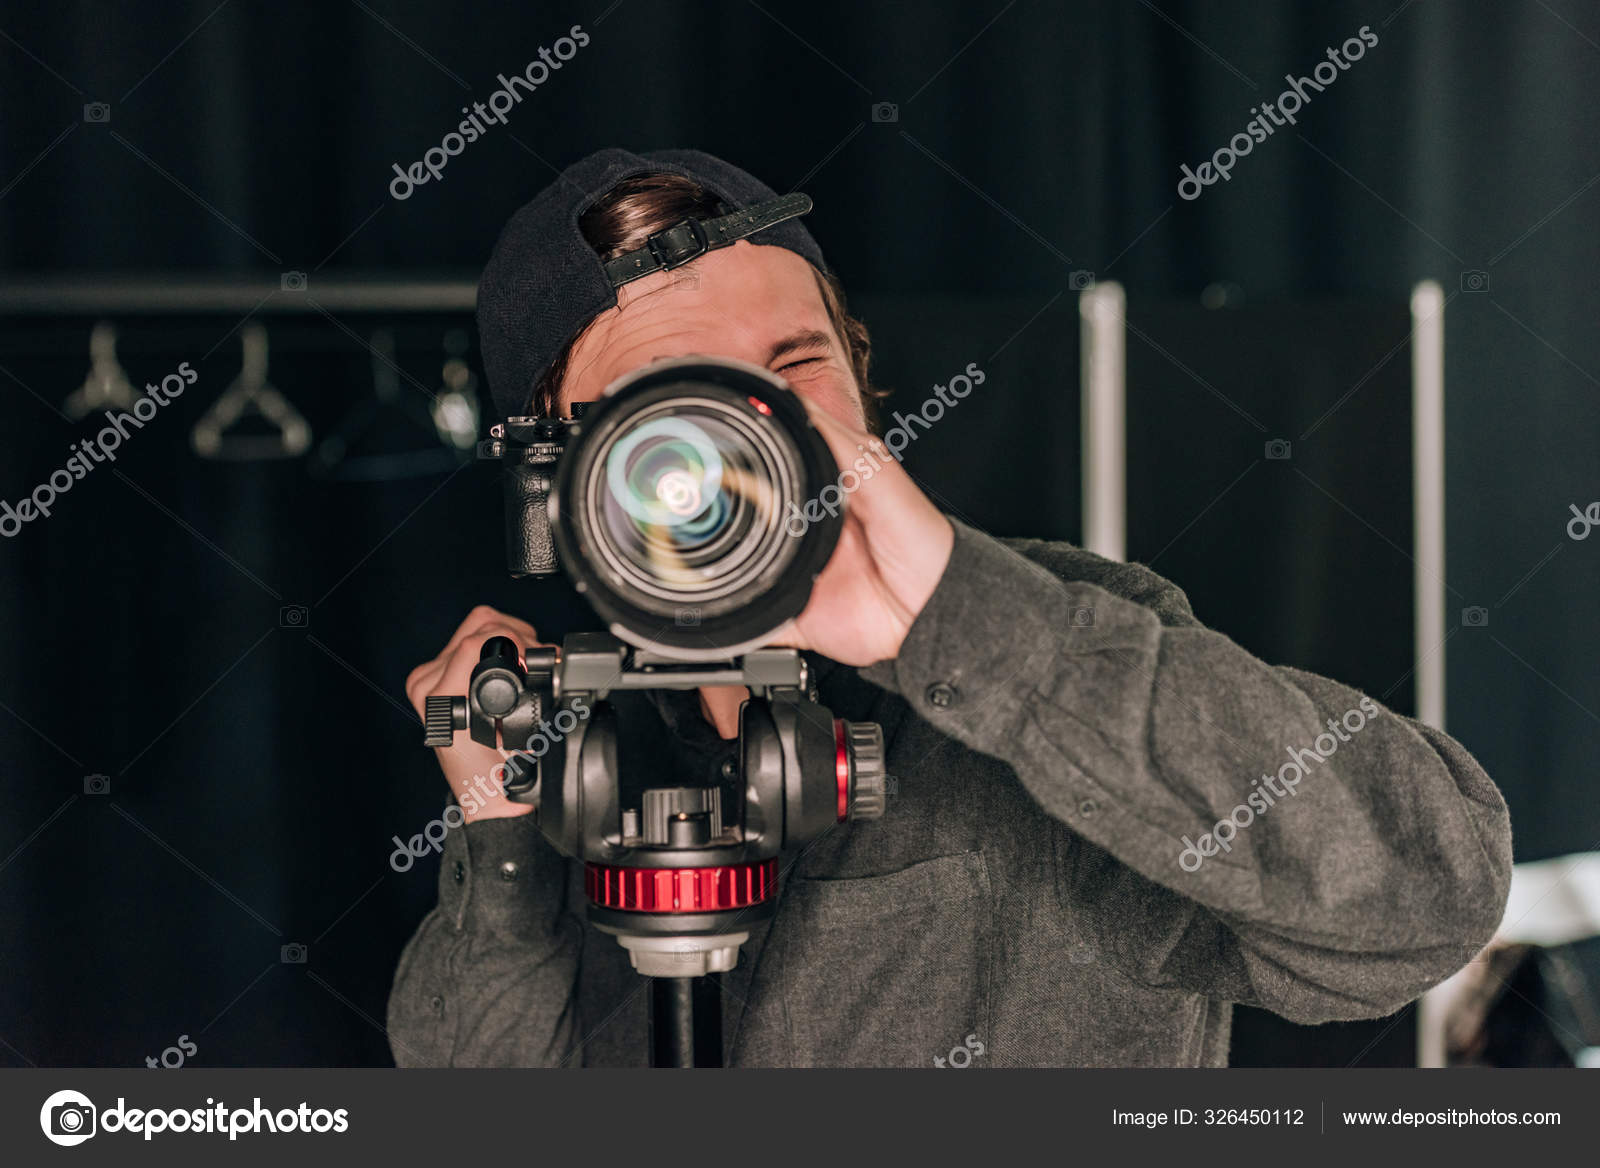 Одно время работал в фотосалоне